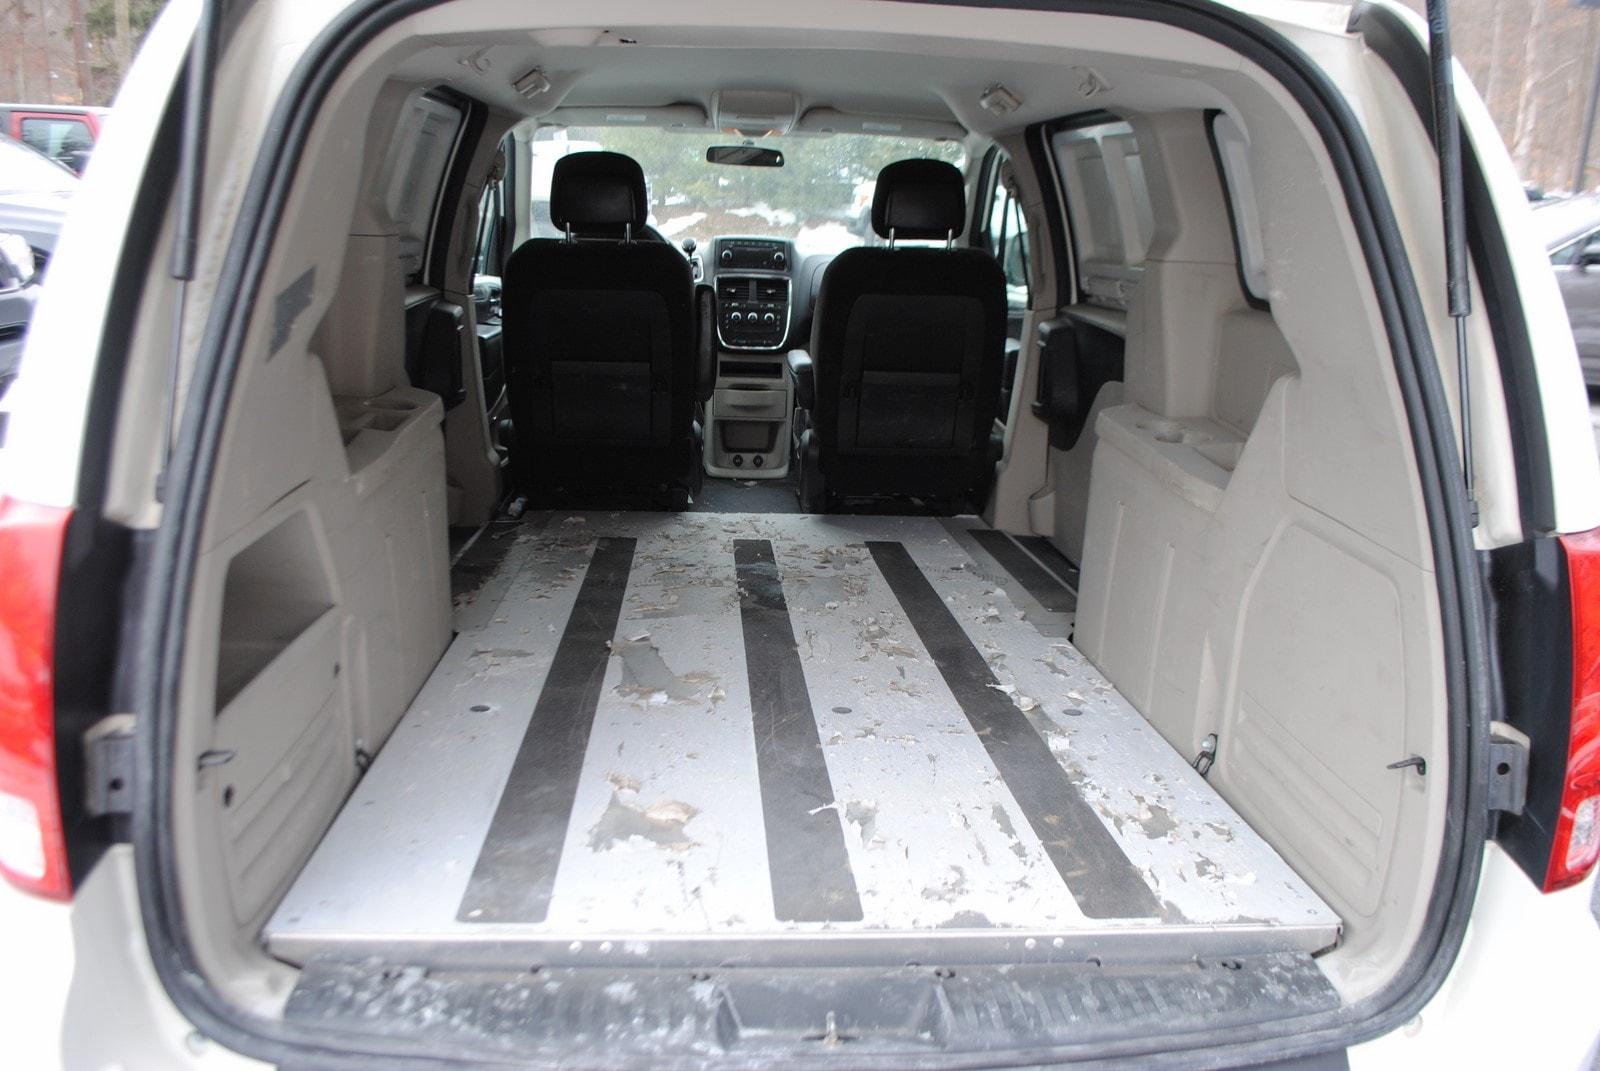 2013 RAM Cargo - Price, Photos, Reviews & Features |2013 Ram Cargo Tradesman Van